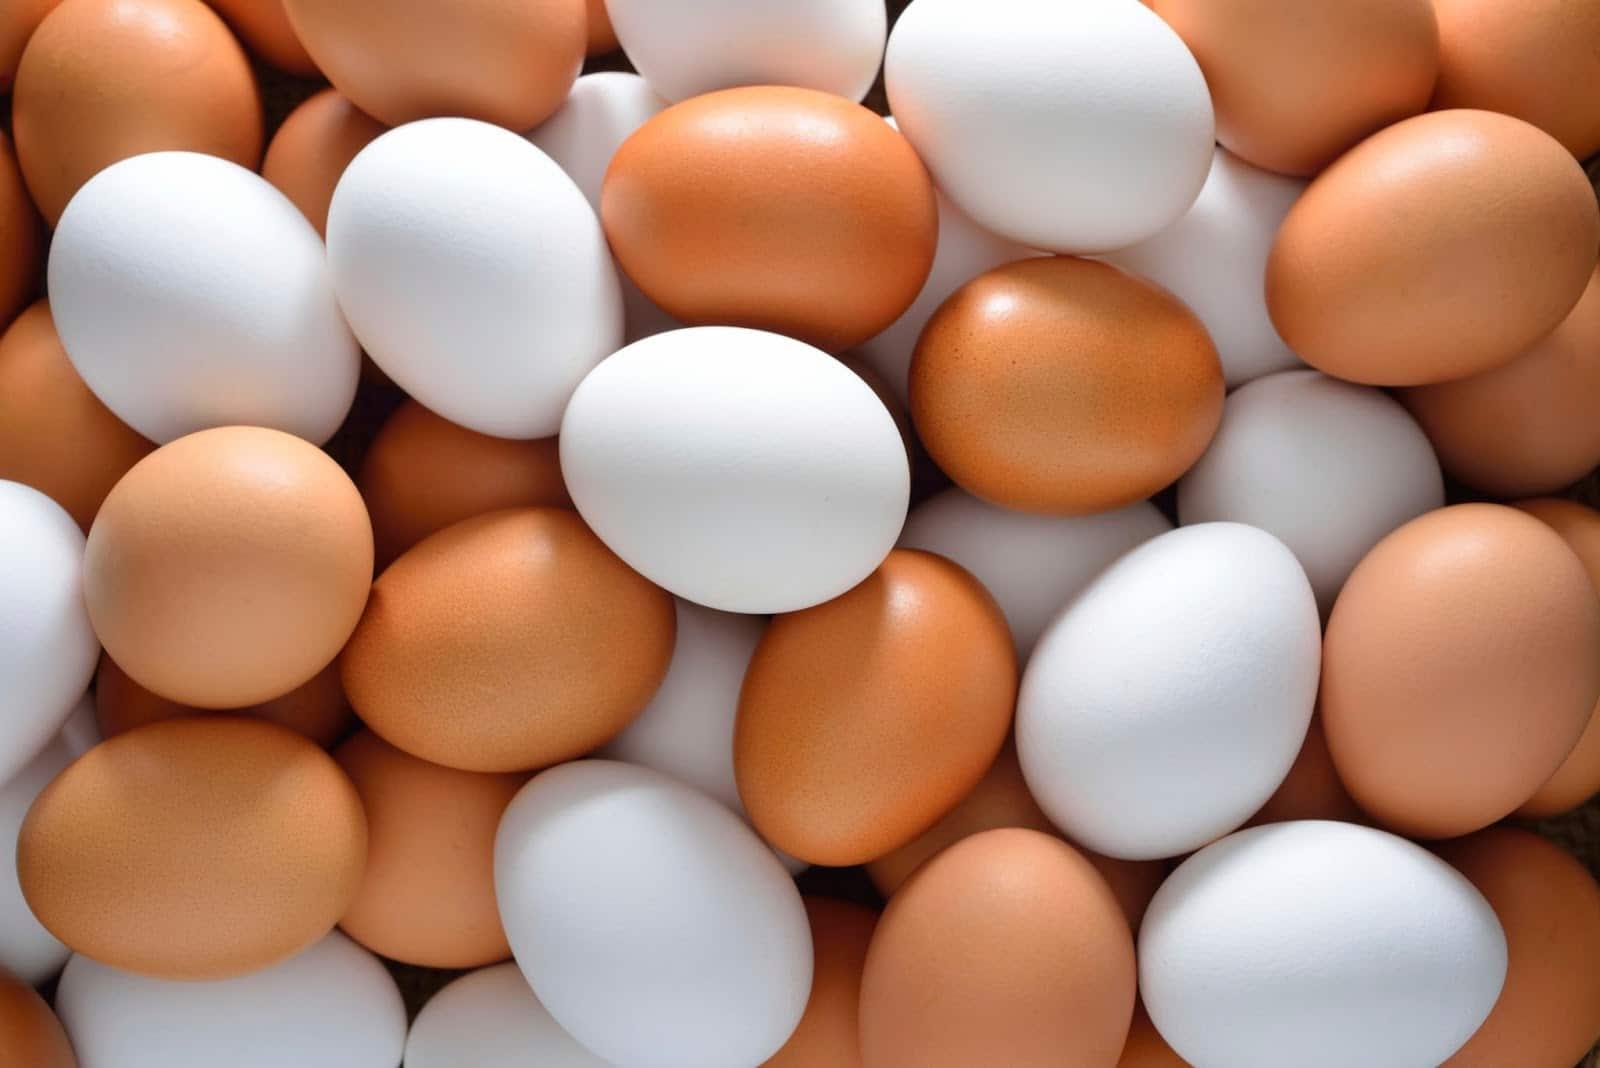 Whole Eggs vs Egg Whites: For GAINZ? – Fitness Volt